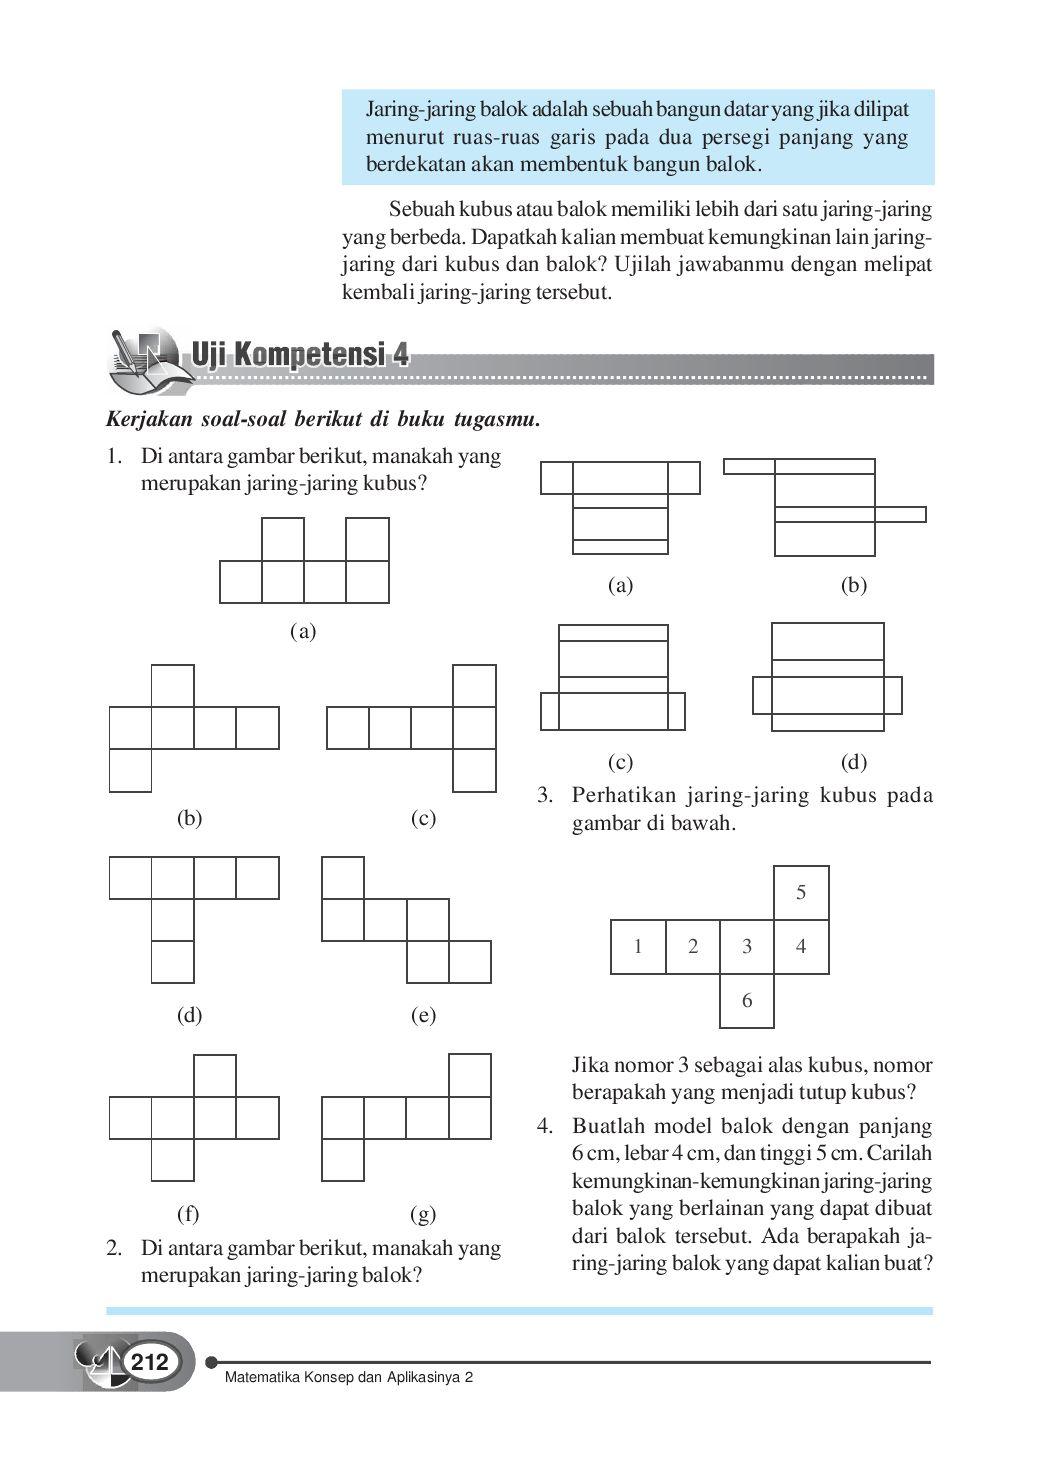 Contoh Soal Jaring-jaring Kubus Dan Balok Kelas 5 Sd : contoh, jaring-jaring, kubus, balok, kelas, Latihan, Jaring, Kubus, Balok, IlmuSosial.id